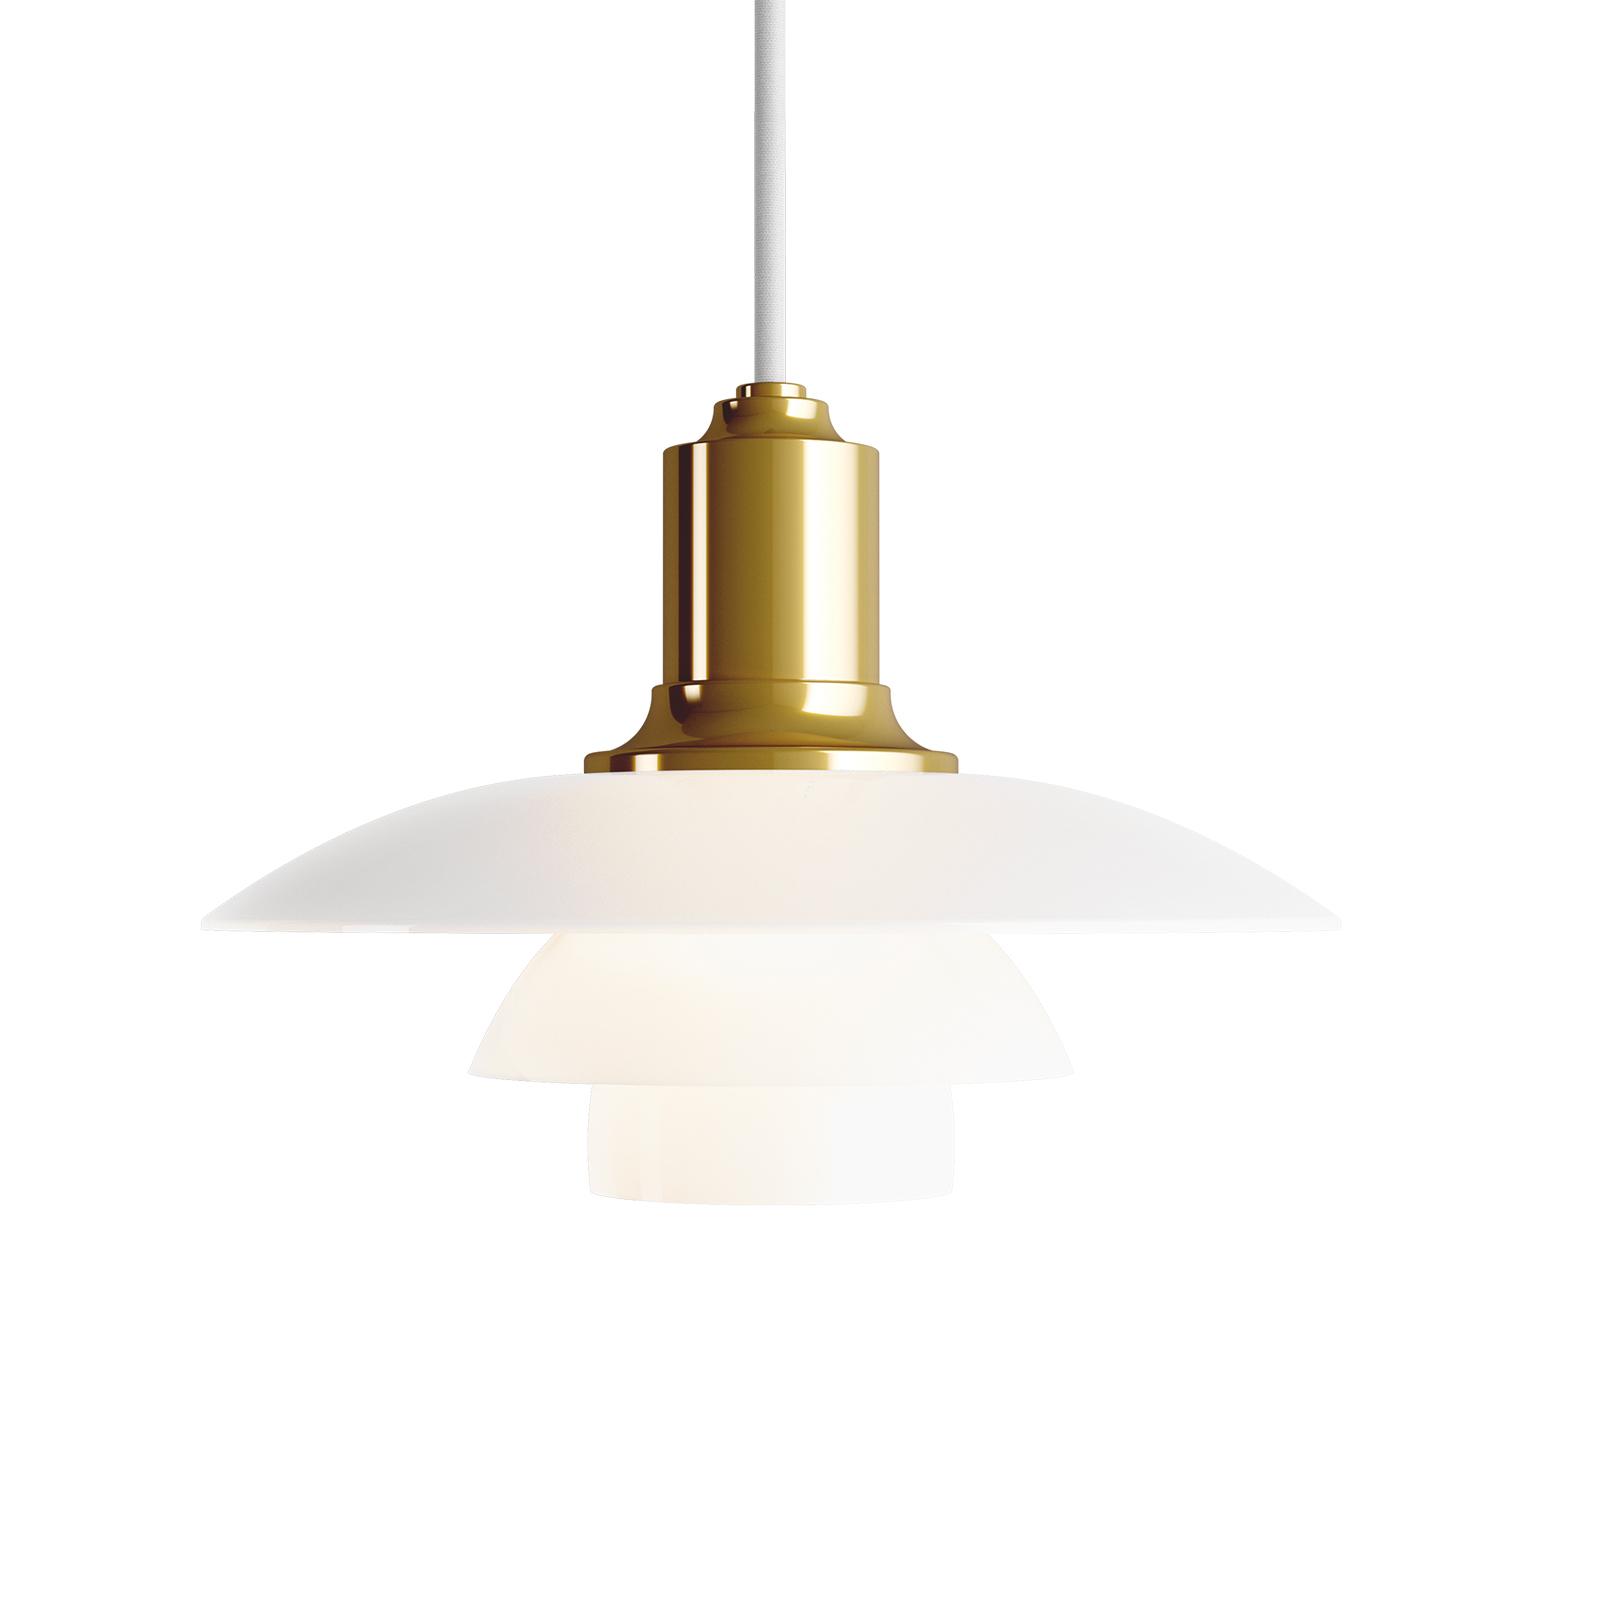 Louis Poulsen PH 2/1 glashængelampe messing